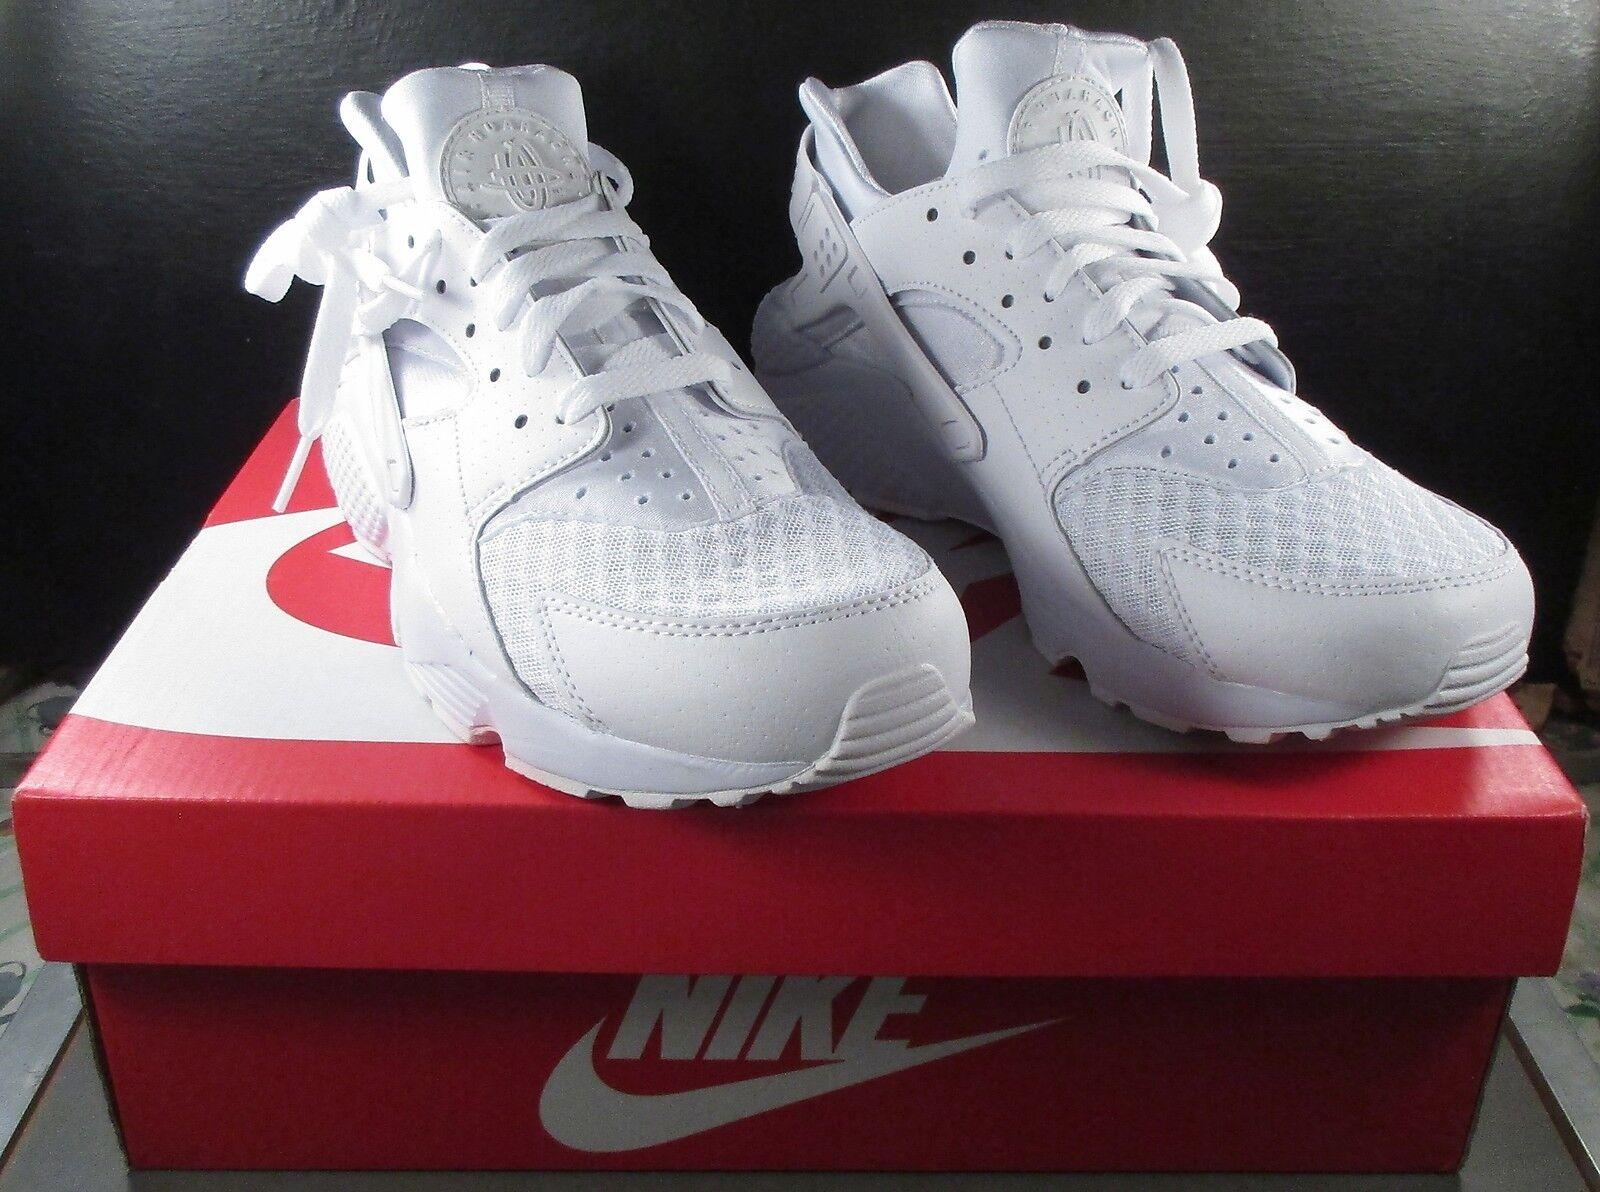 1337e4ac3a1 New Nike Air Huarache White Pure Platinum Platinum Platinum Running Shoes  Sneakers 318429-111 Sz